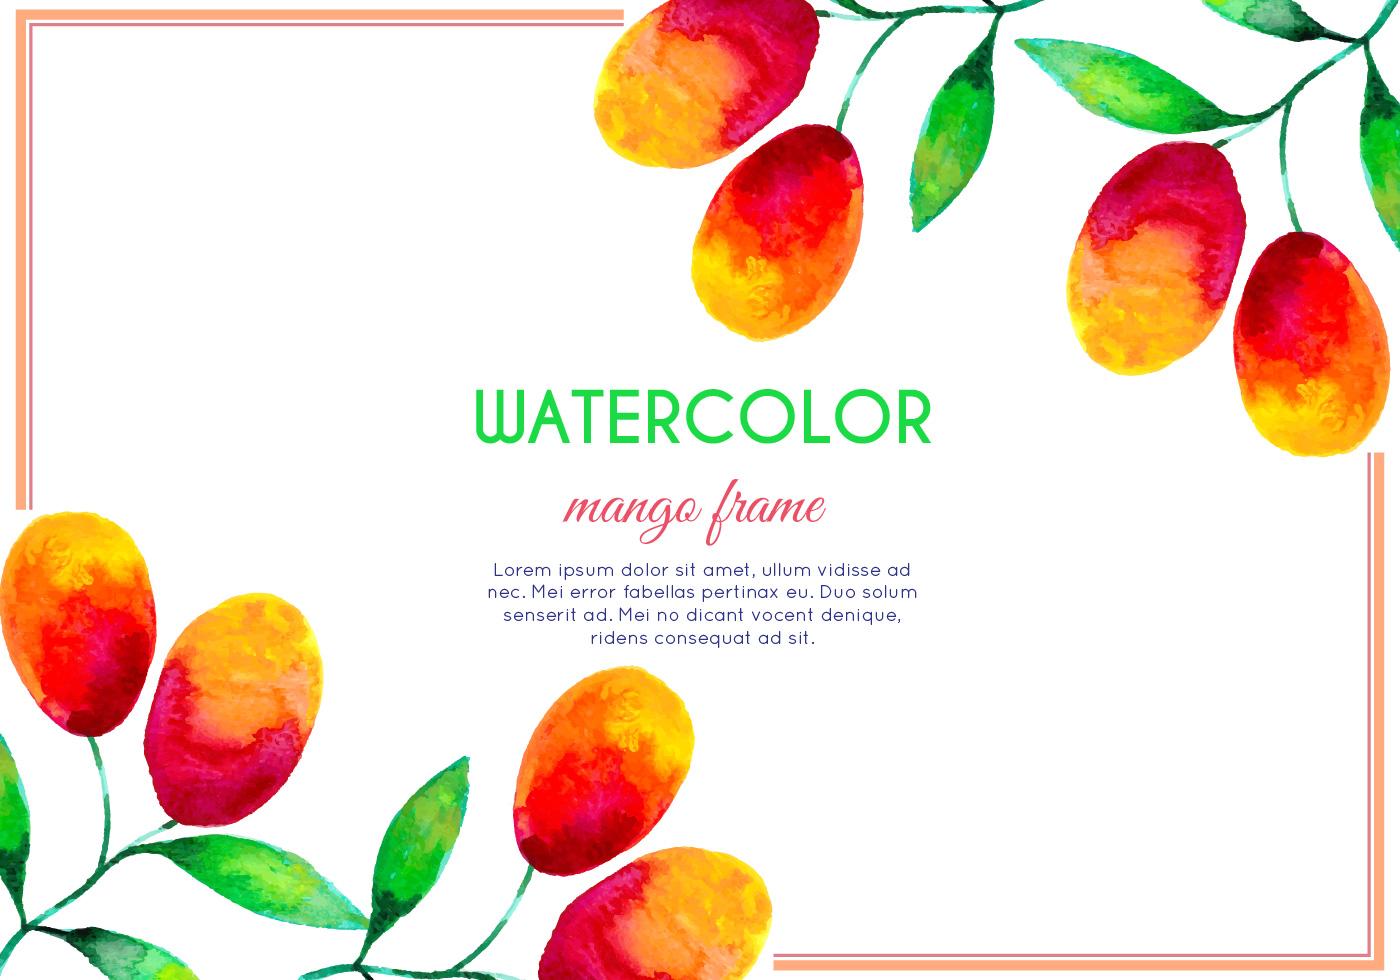 Vector Watercolor Mango Frame - Download Free Vector Art, Stock ...